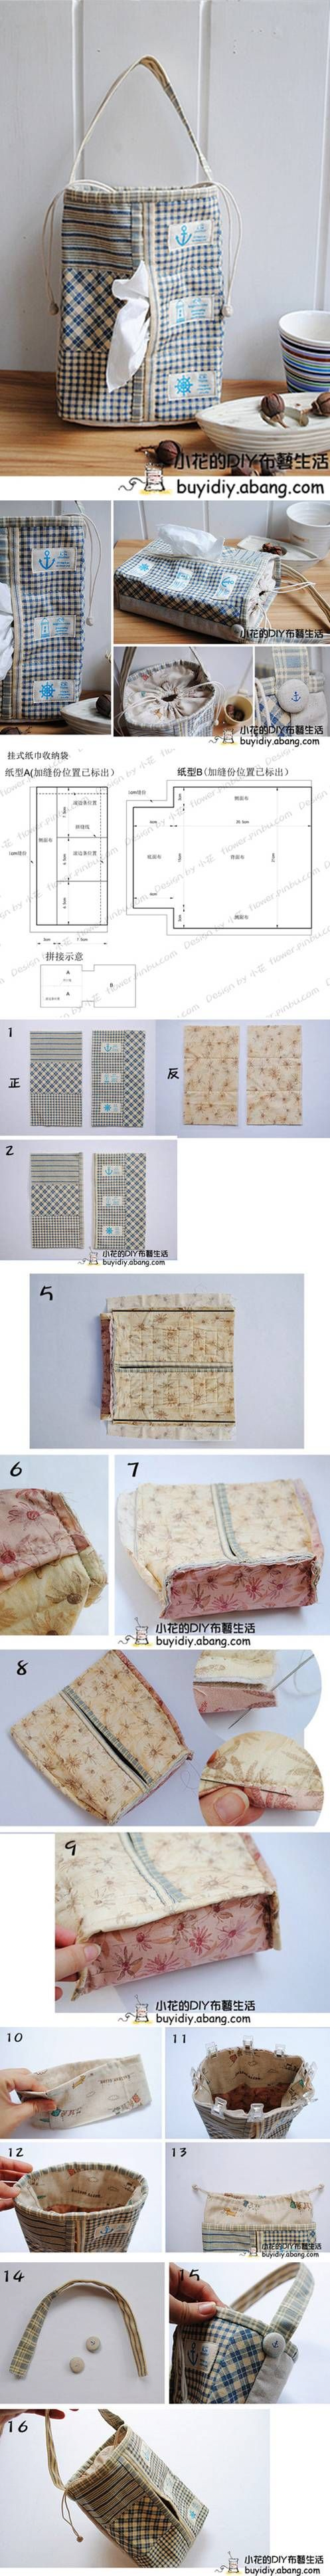 DIY Simple Towel Pouch